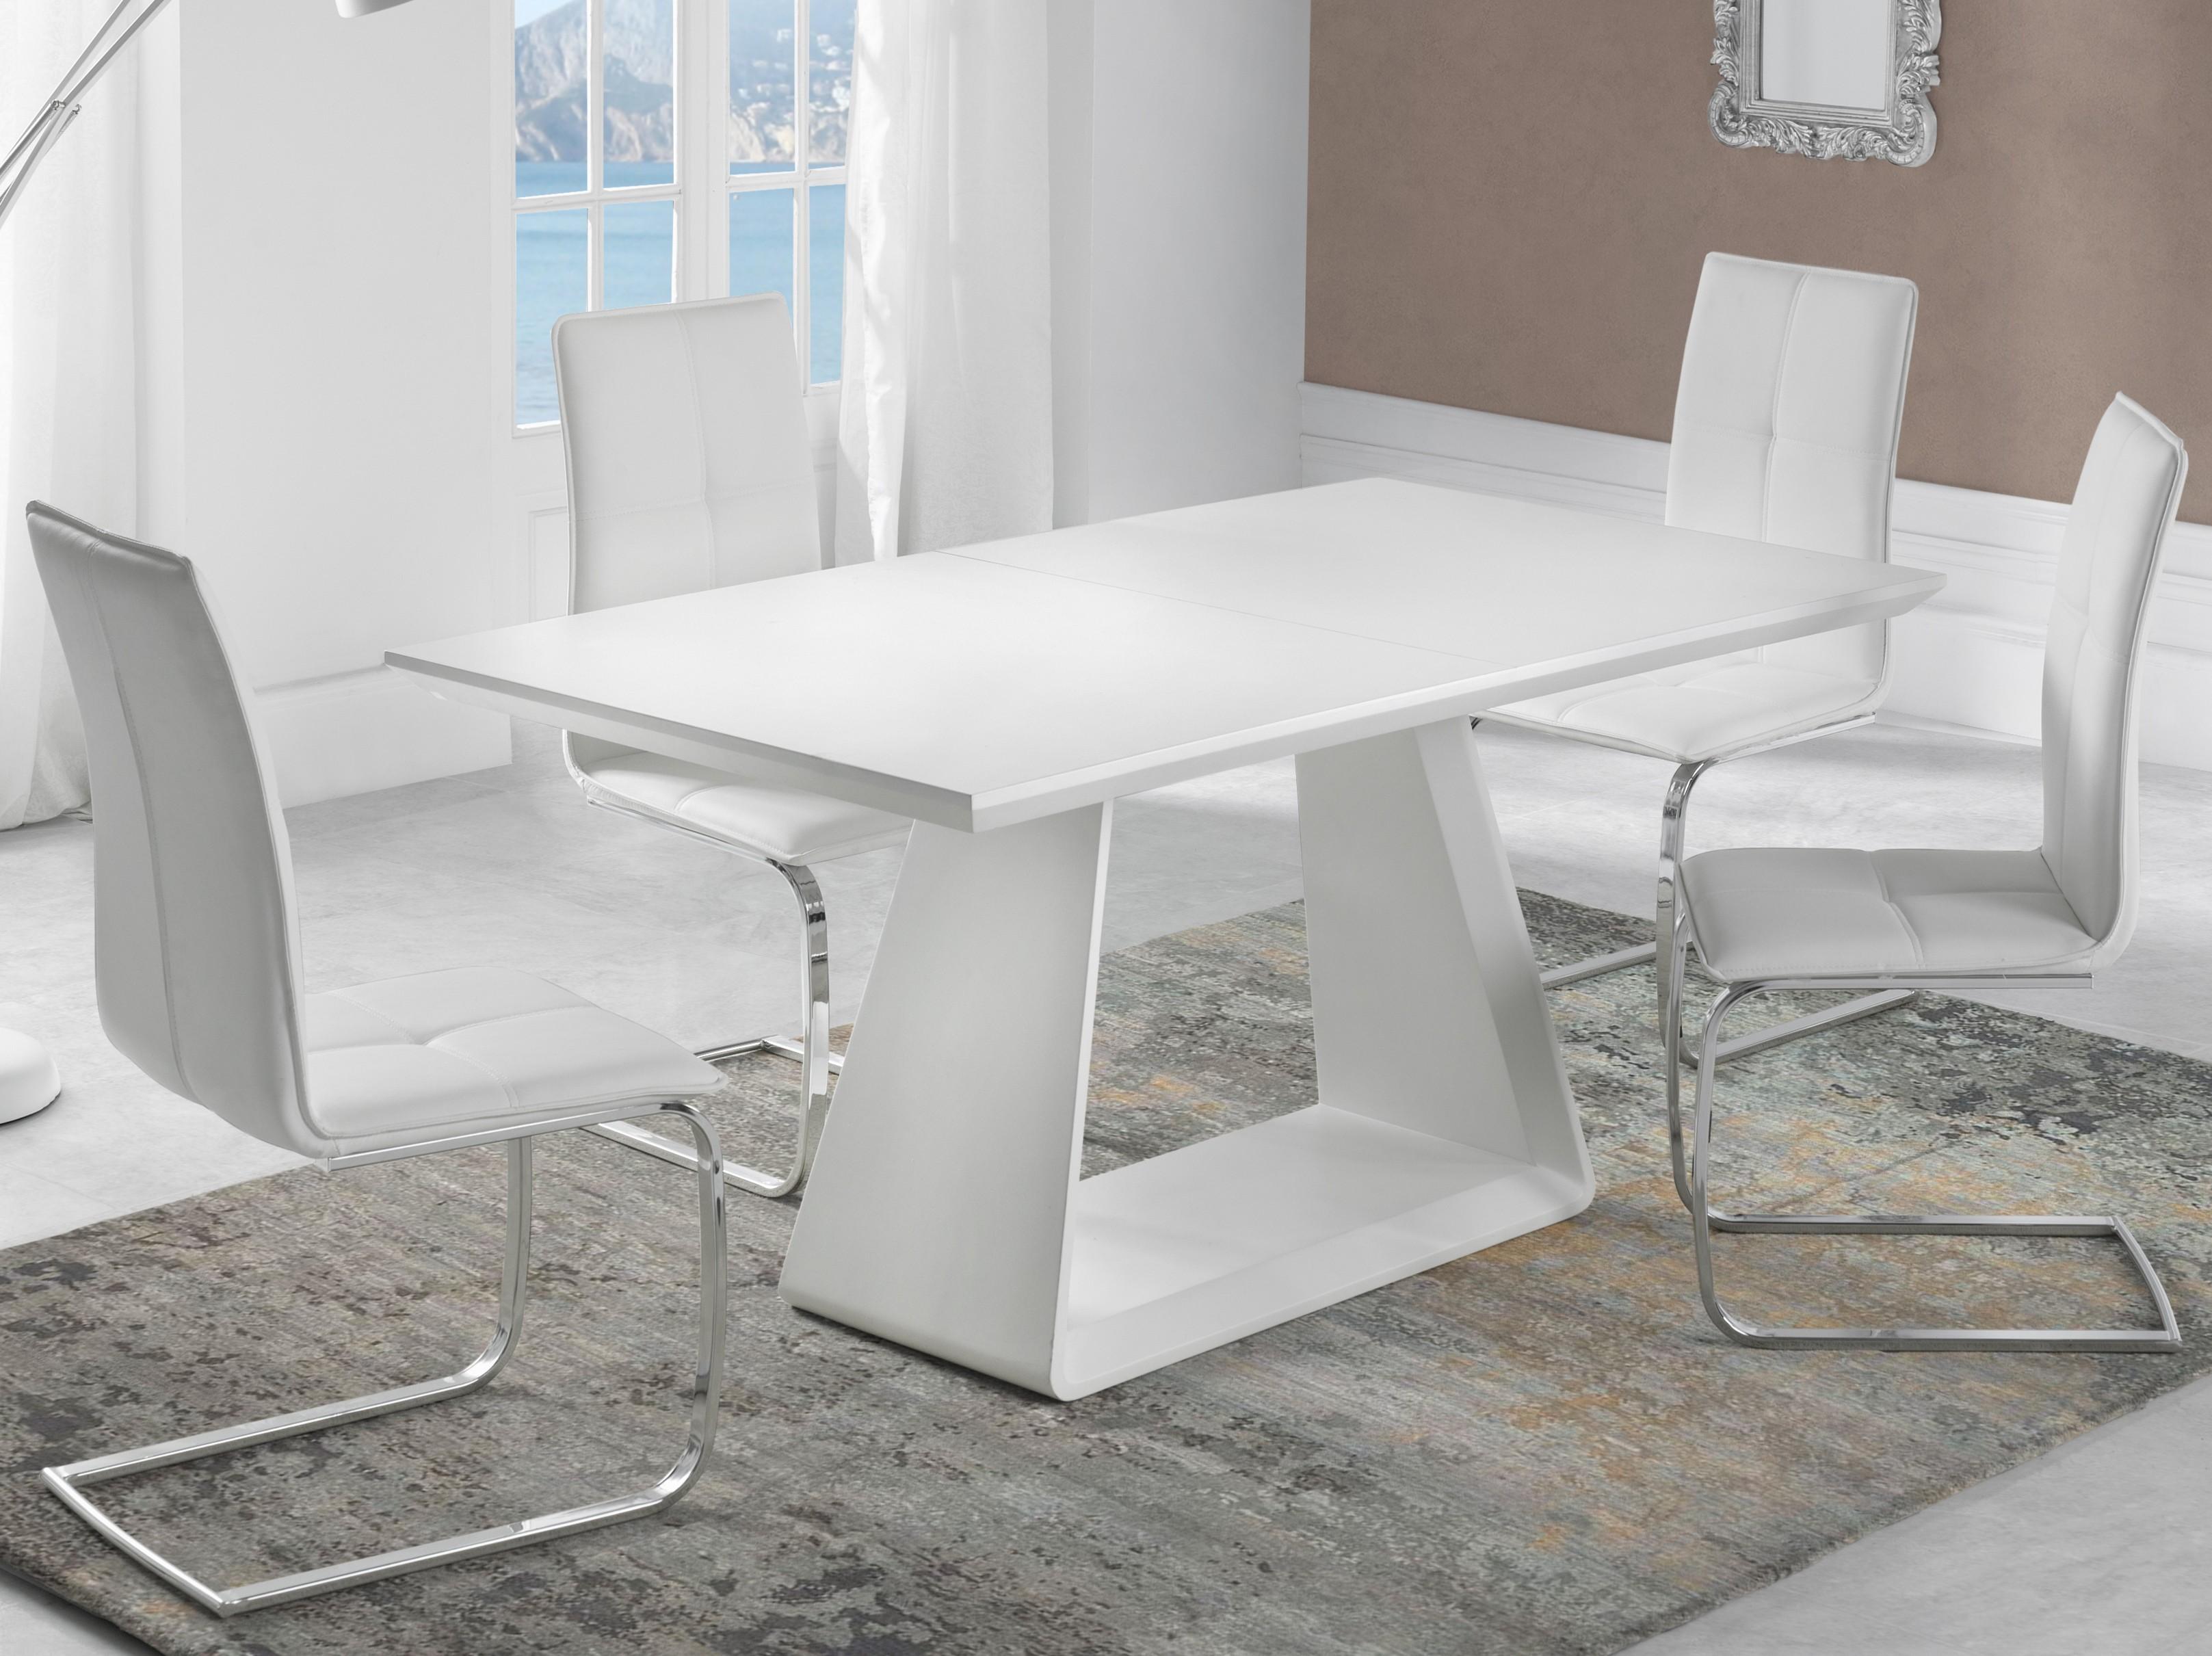 table manger extensible pied central blanc laqu mat holena. Black Bedroom Furniture Sets. Home Design Ideas